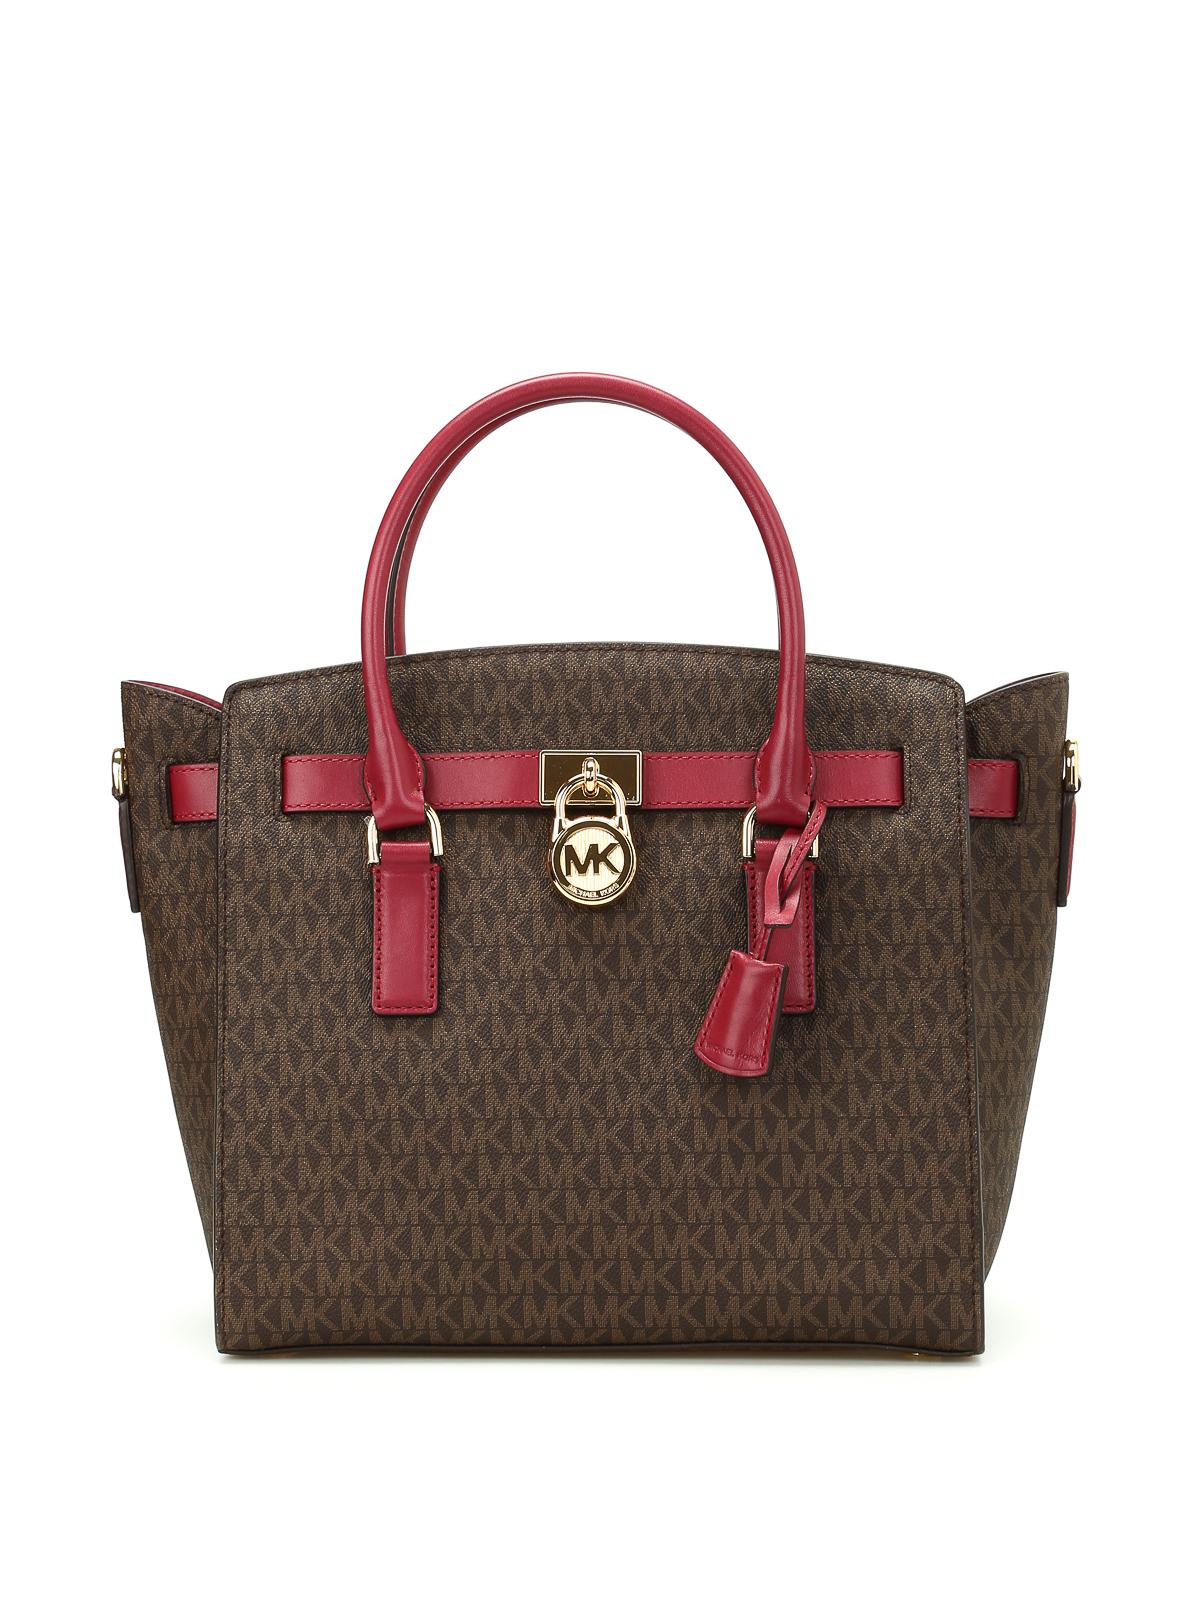 hamilton logo coated twill handbag by michael kors totes. Black Bedroom Furniture Sets. Home Design Ideas